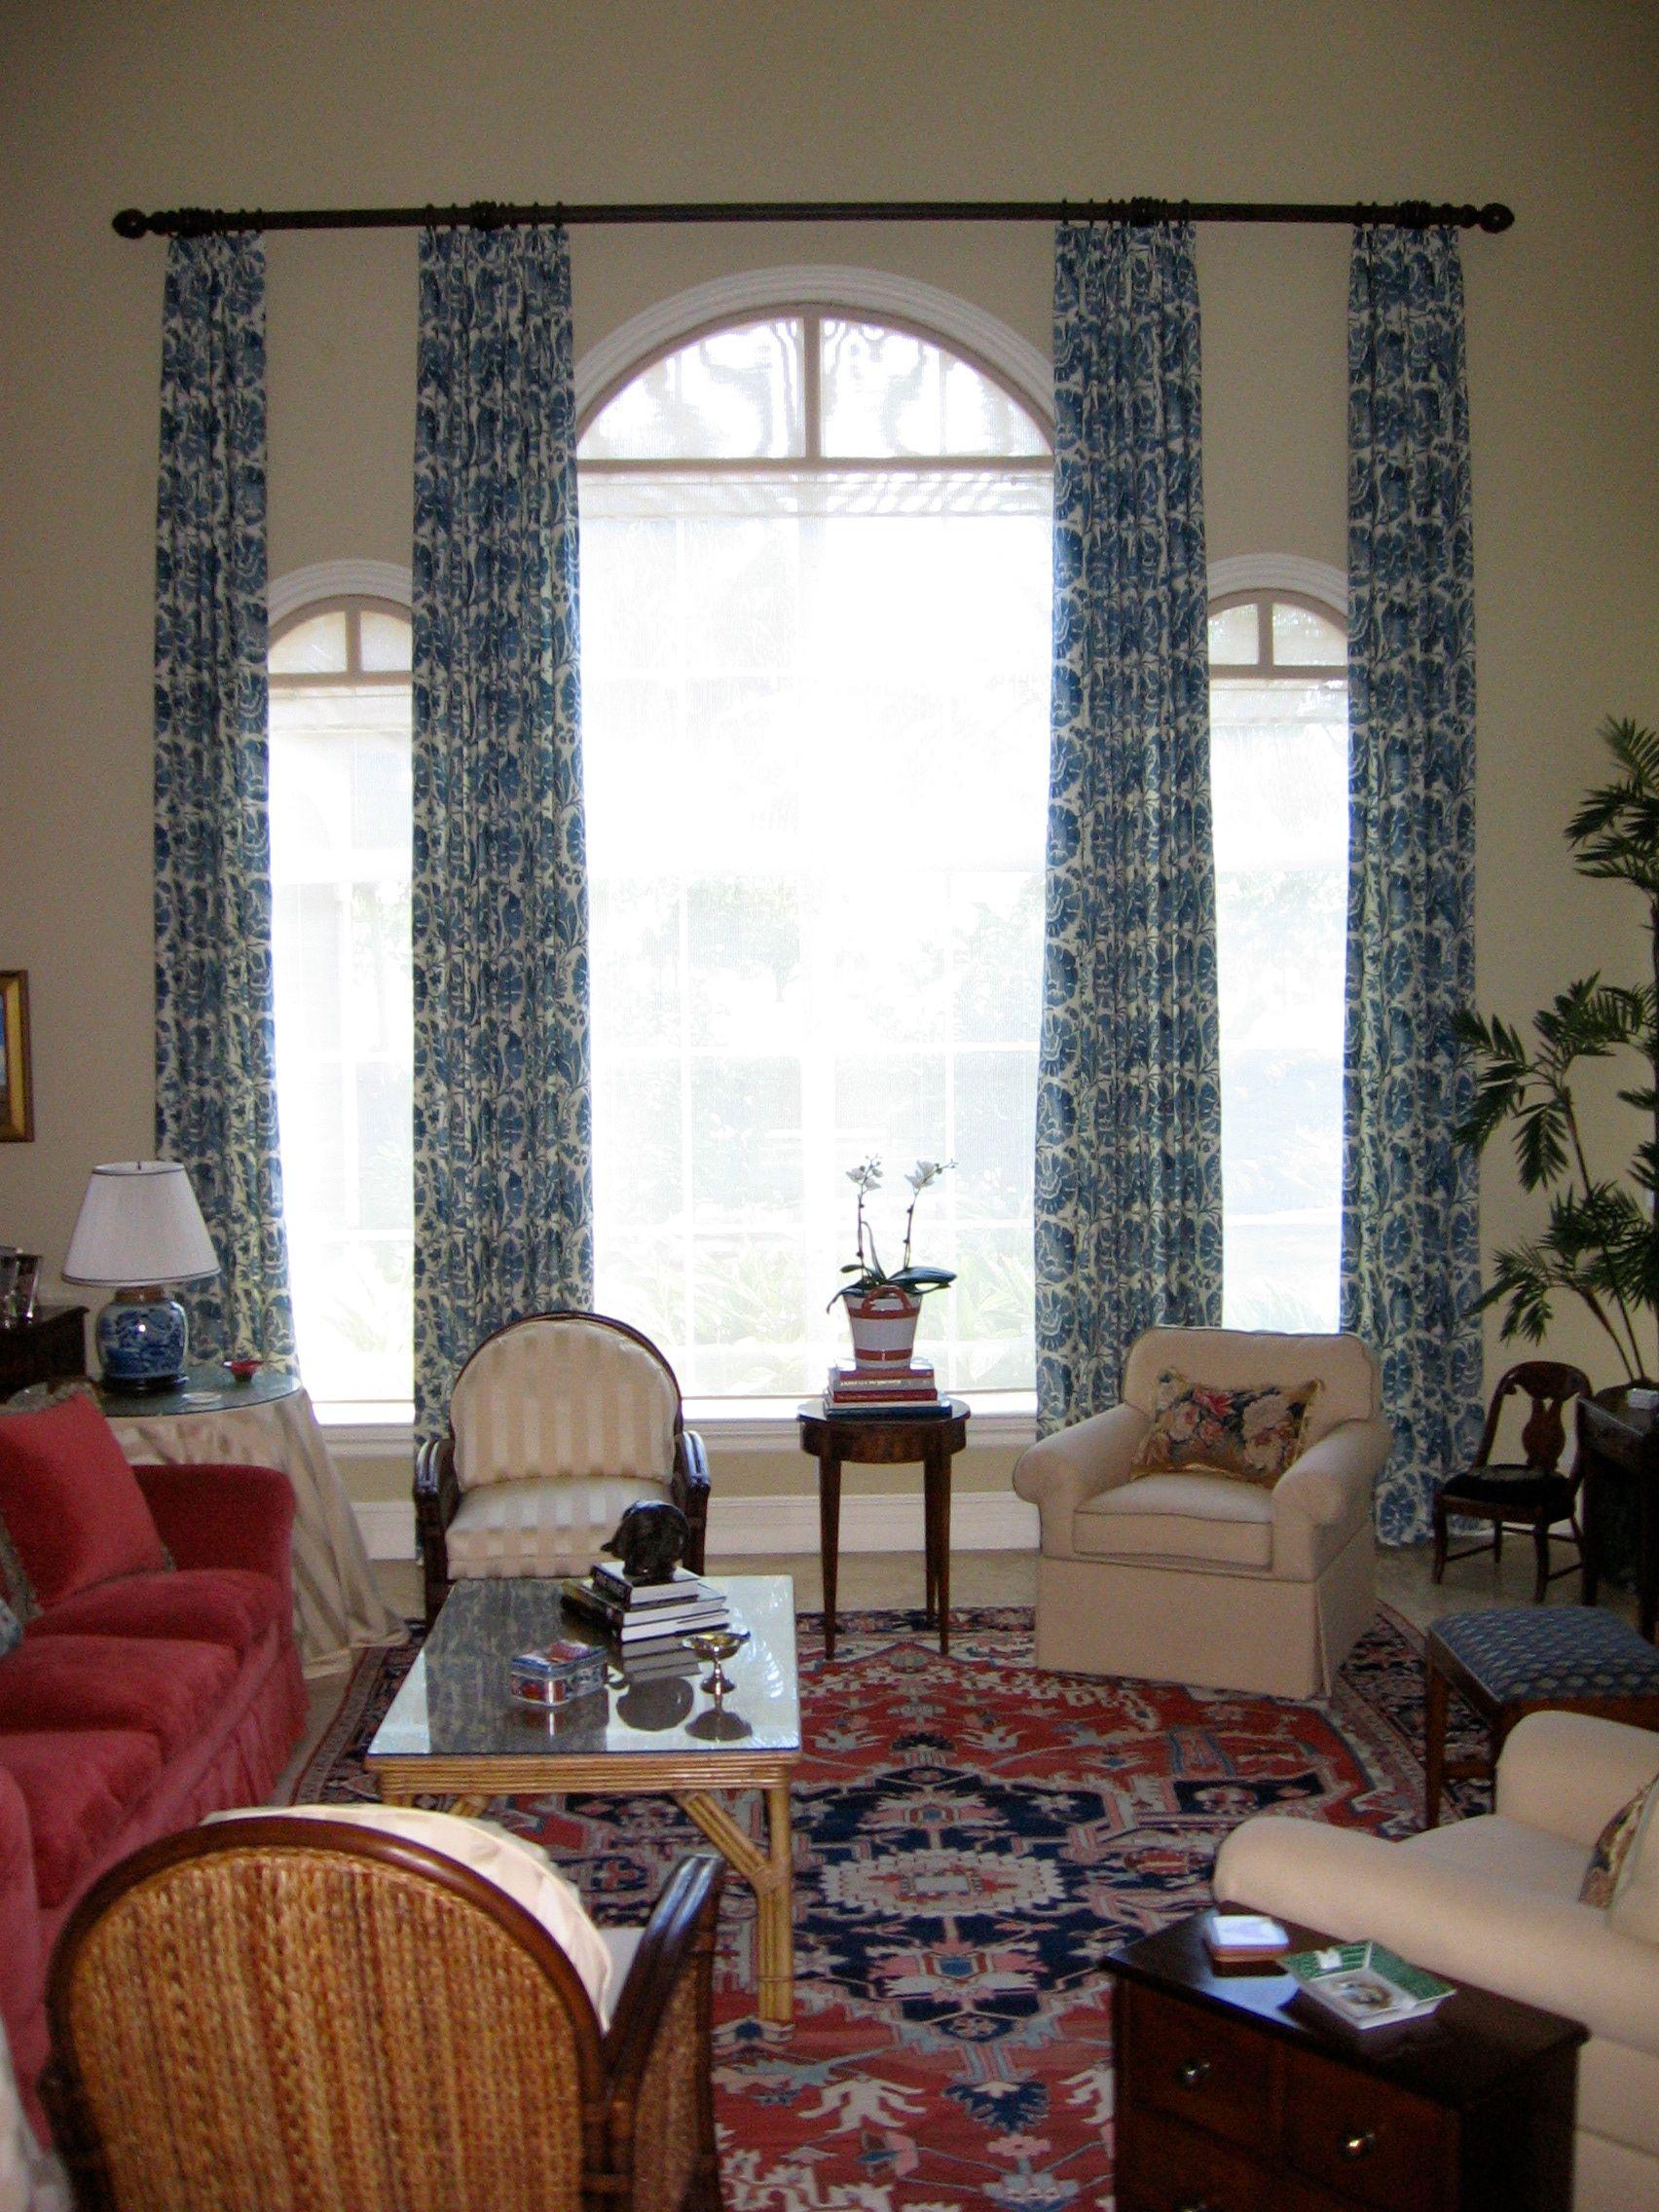 Window Treatments For 14 Round Windows Pictures  Arched Unique Bedroom Window Designs Design Decoration